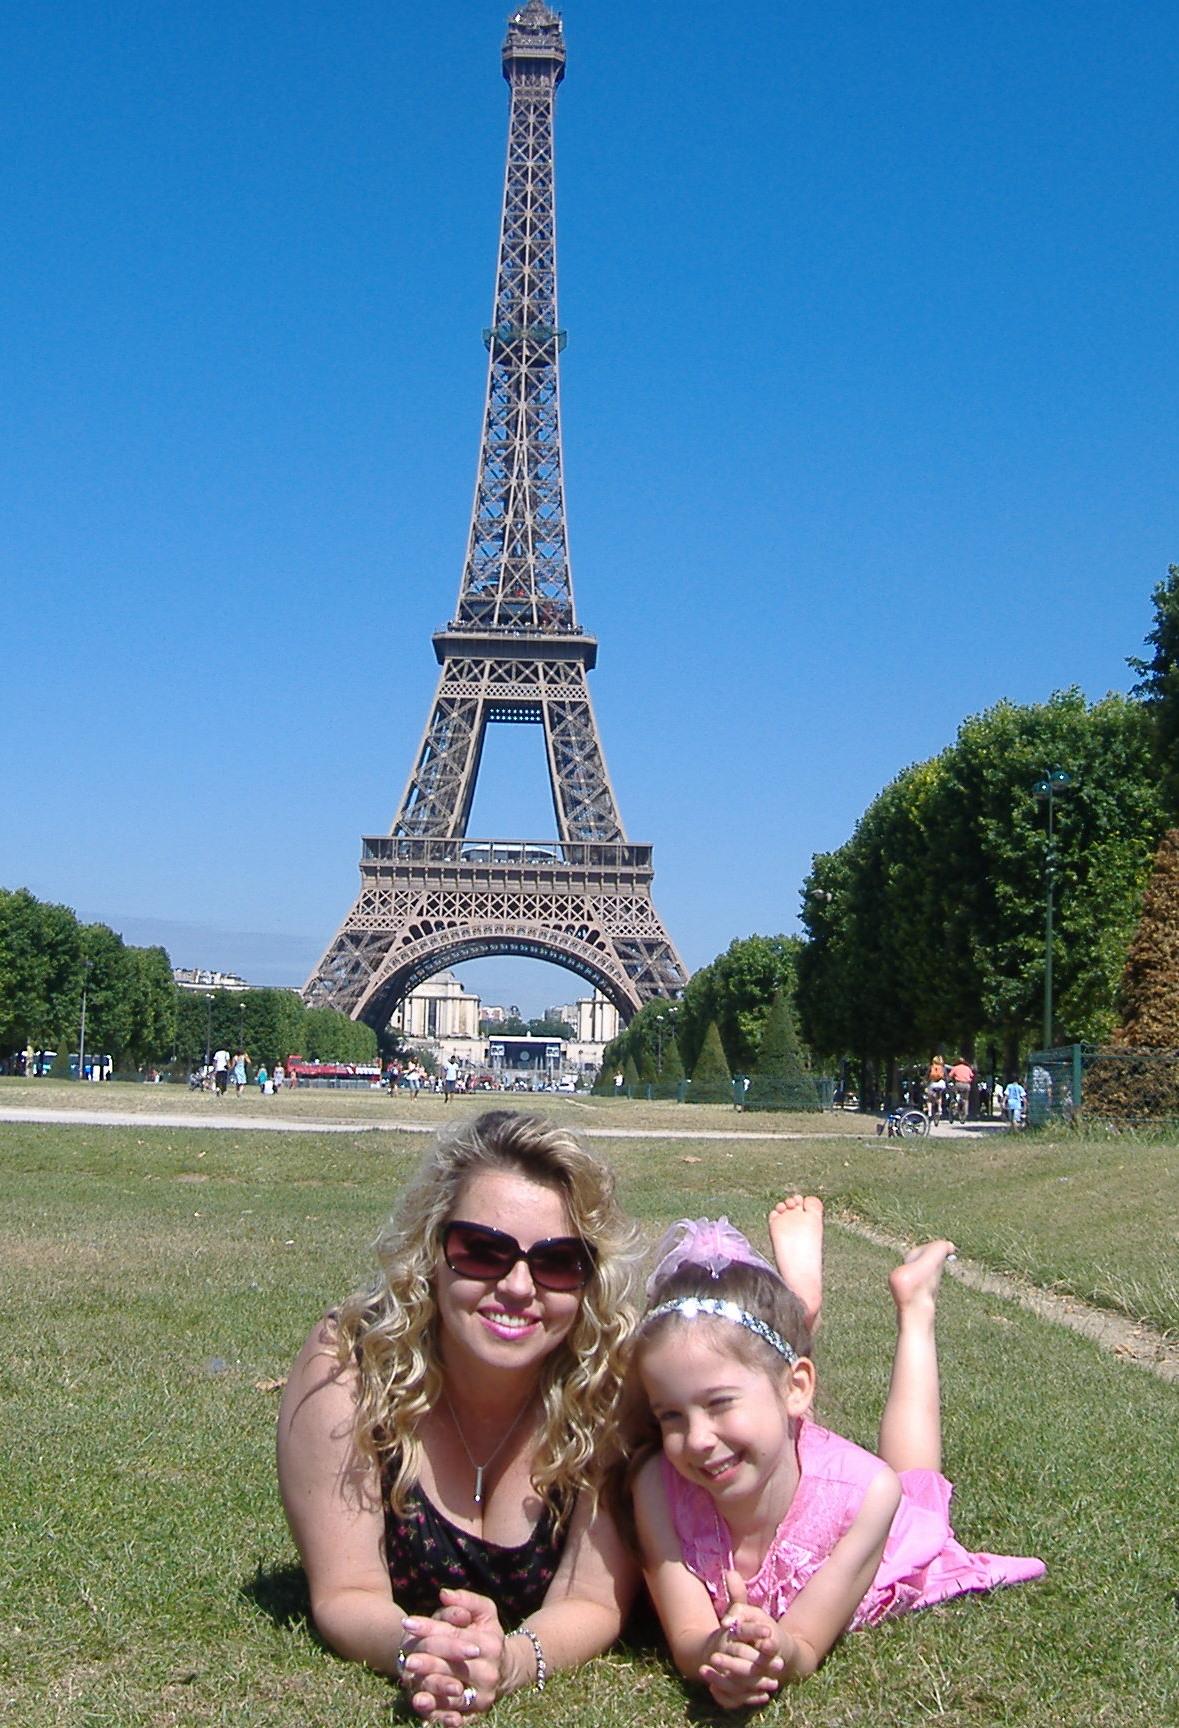 Brenda & Bella in Paris - July 2009